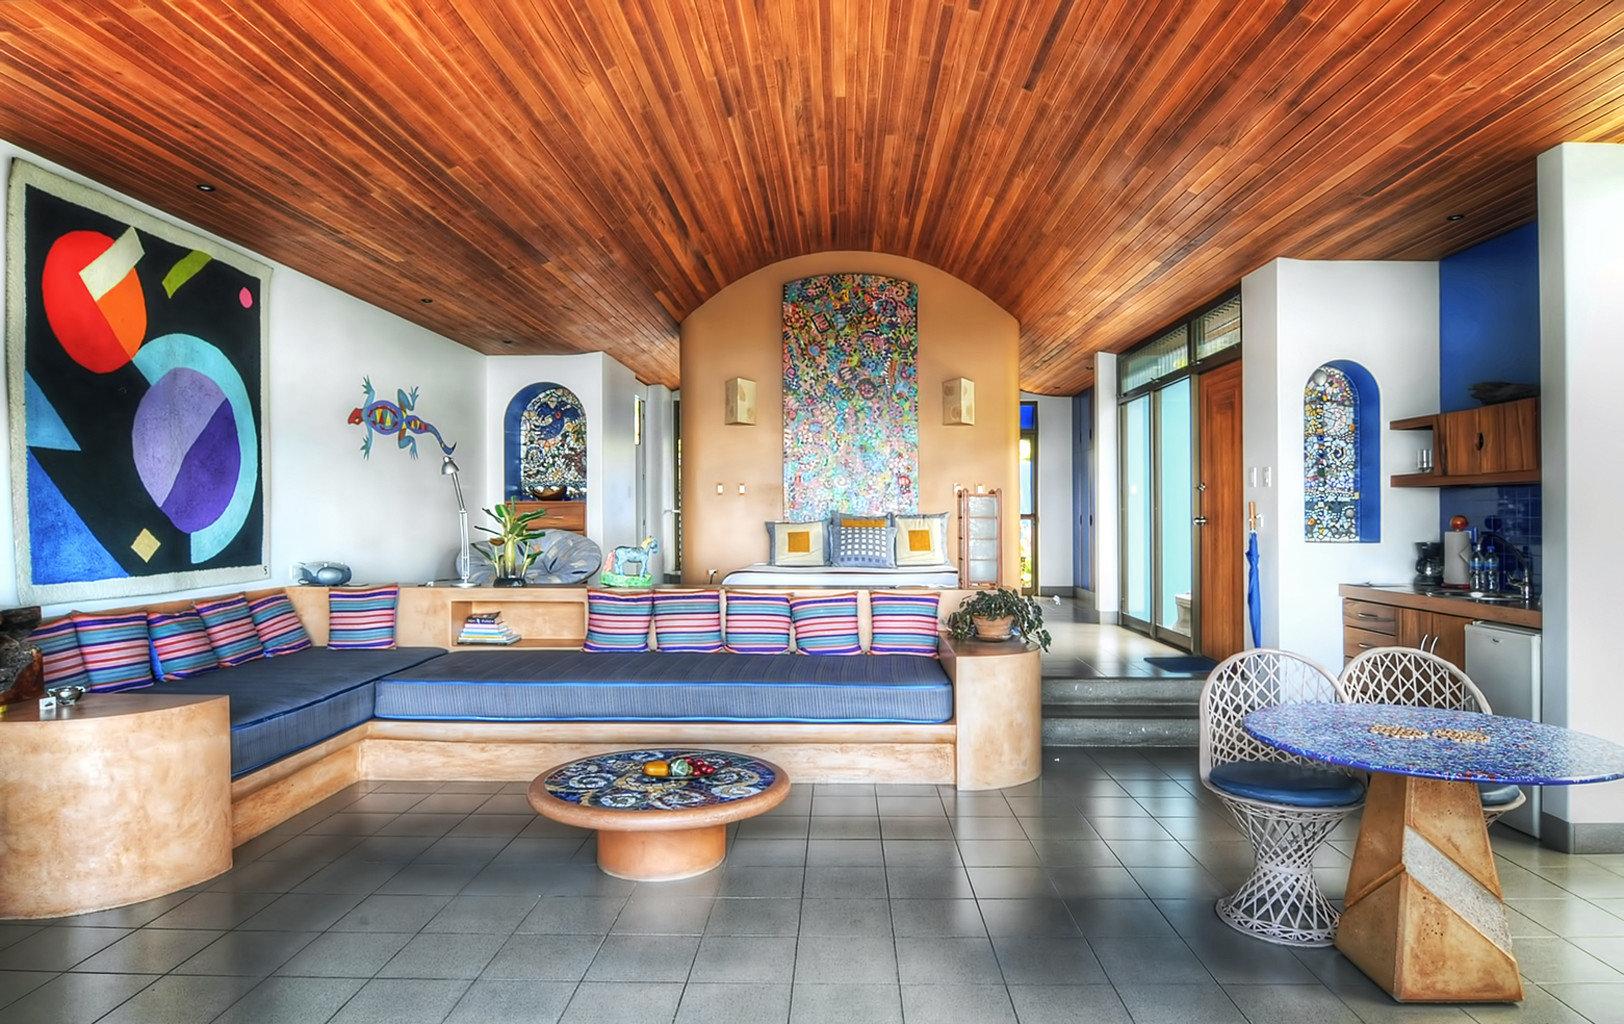 Bedroom Suite Wellness property living room home Lobby mansion Villa hacienda stone